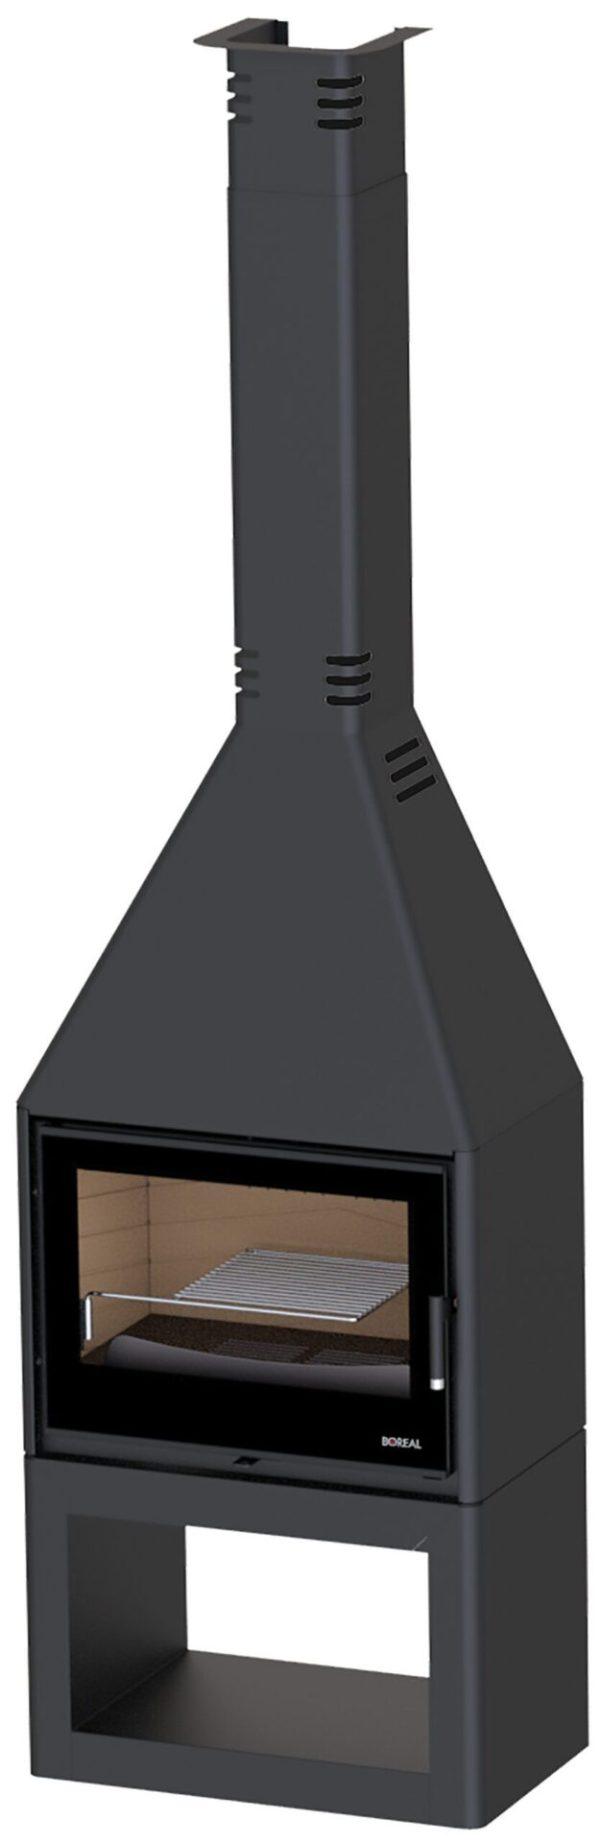 chimenea de leña boreal CH3000